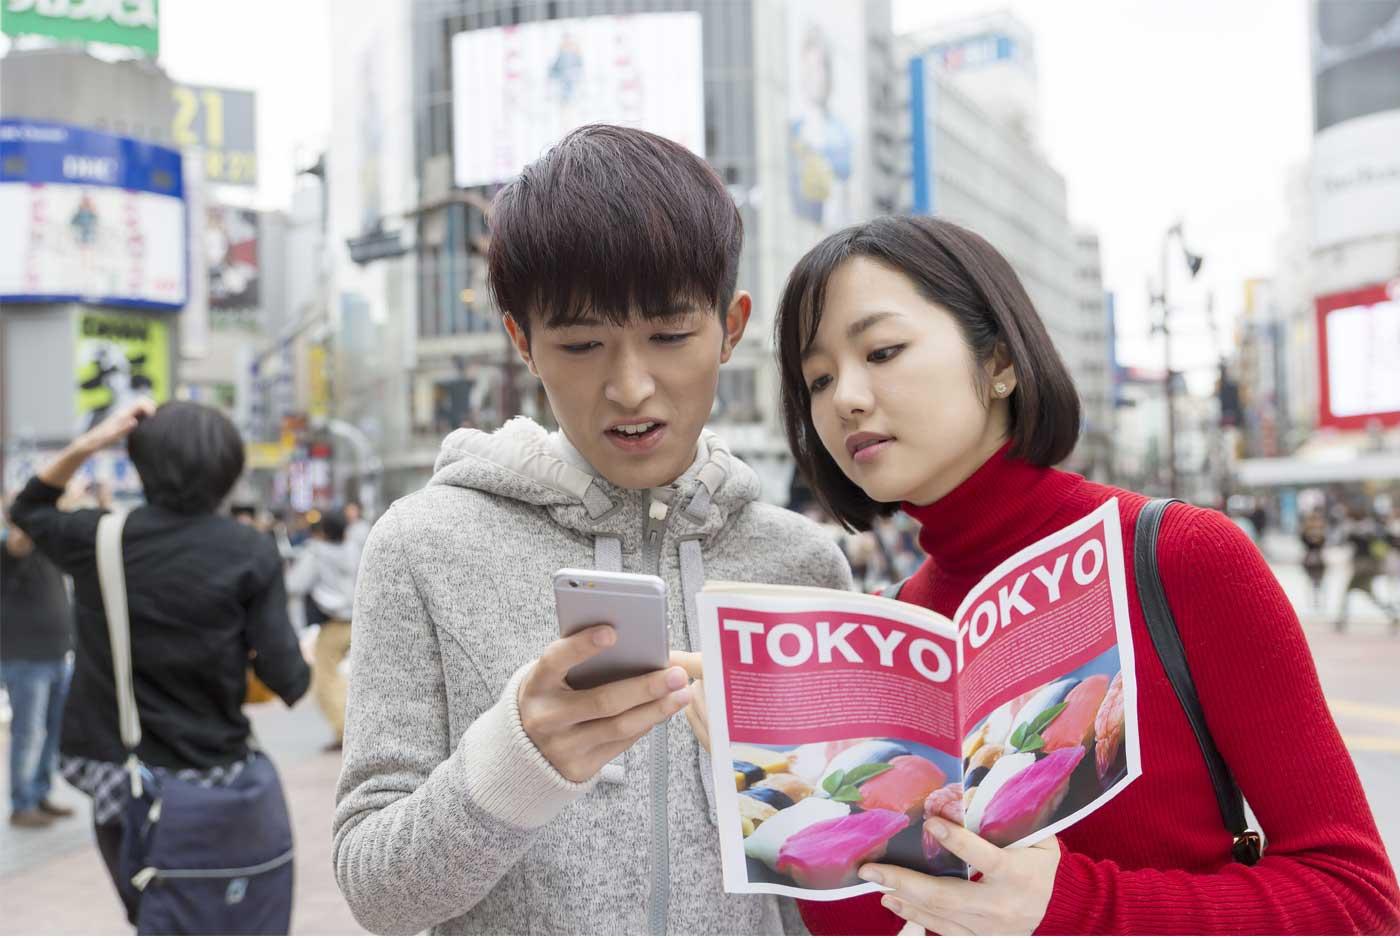 Photo of 訪日外国人の個人レベルのニーズを知るために弊社がモニターしている英語圏の巨大サイト